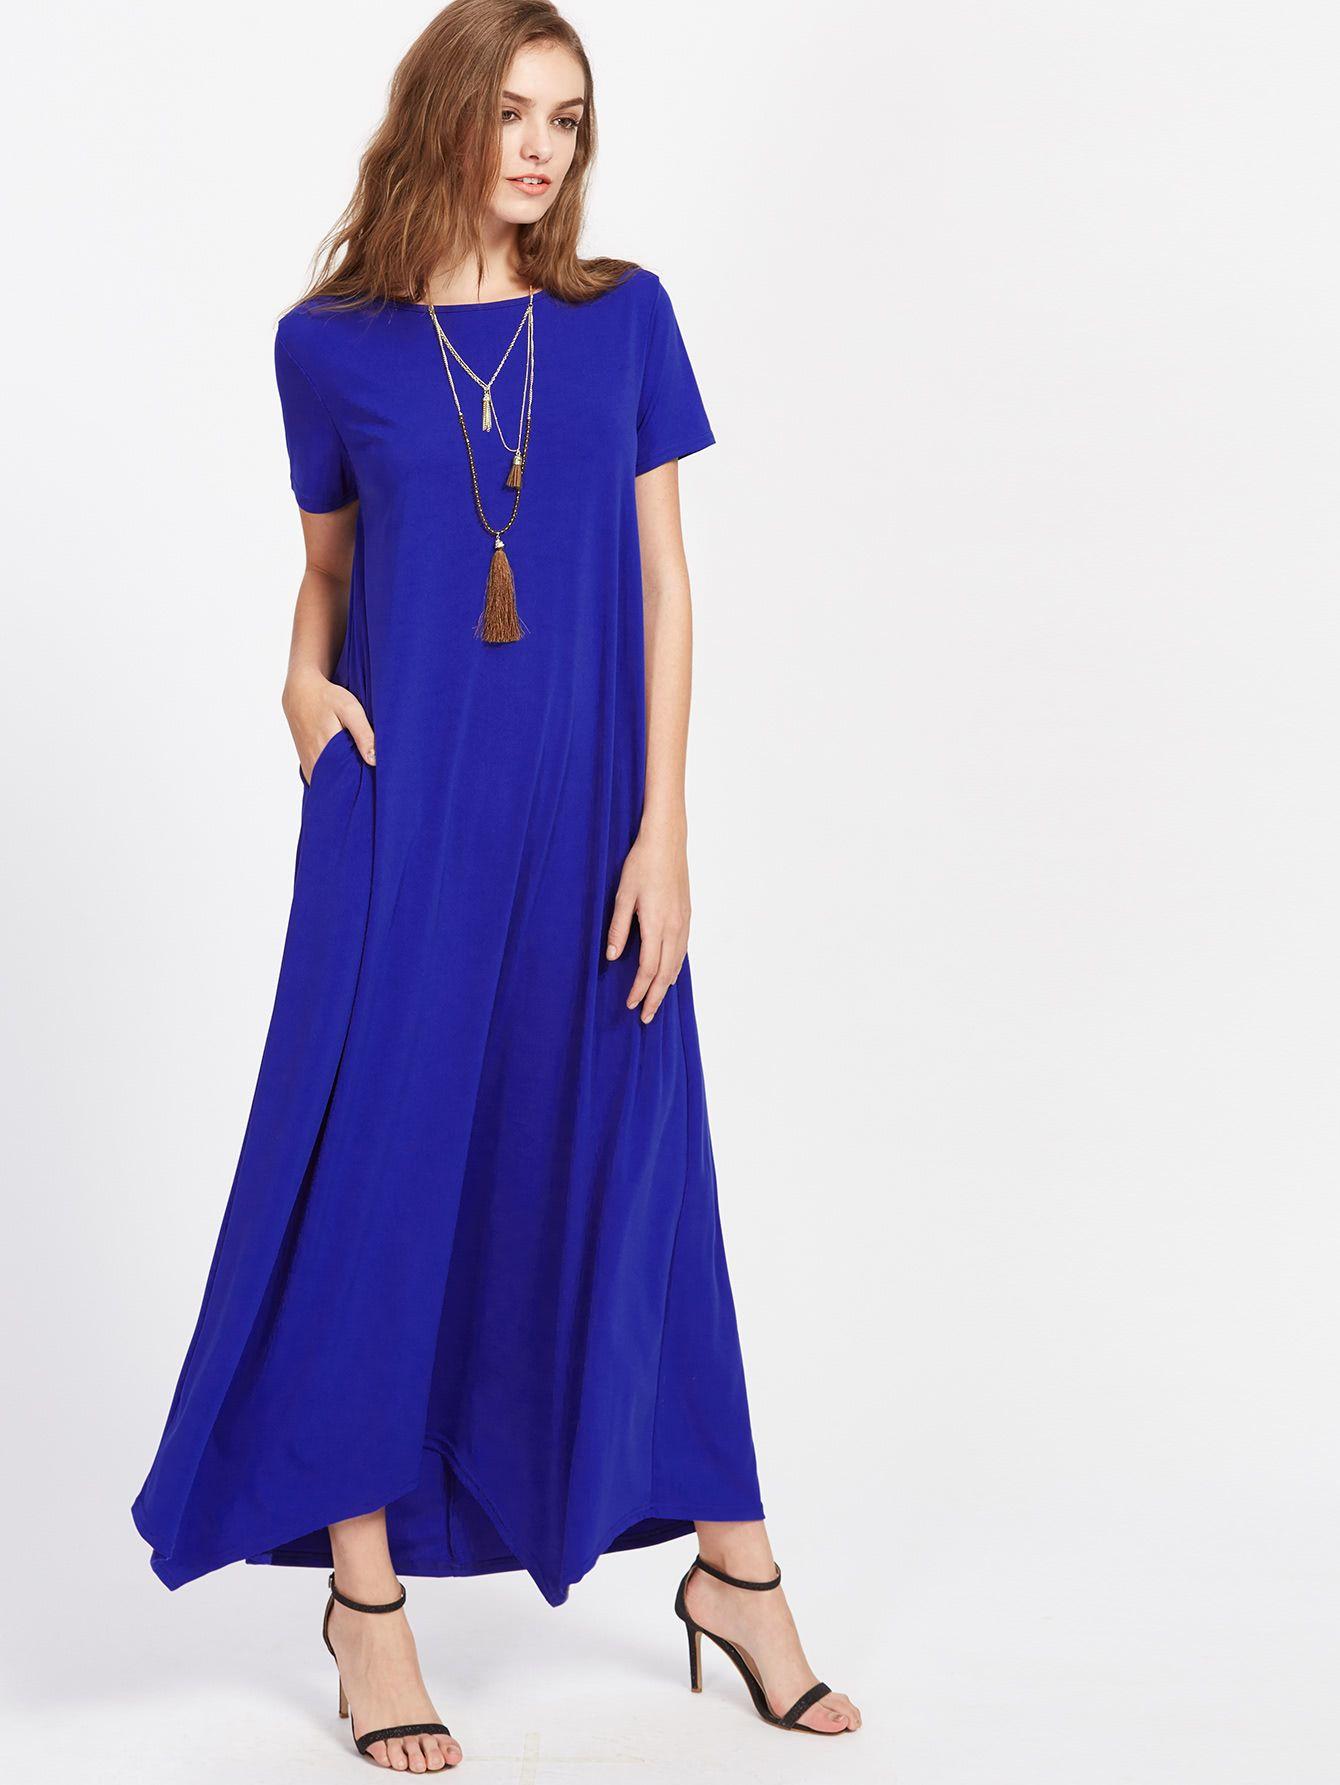 Hanky Hem Tent Dress With Hidden Pocket   Pinterest   Vestidos ...